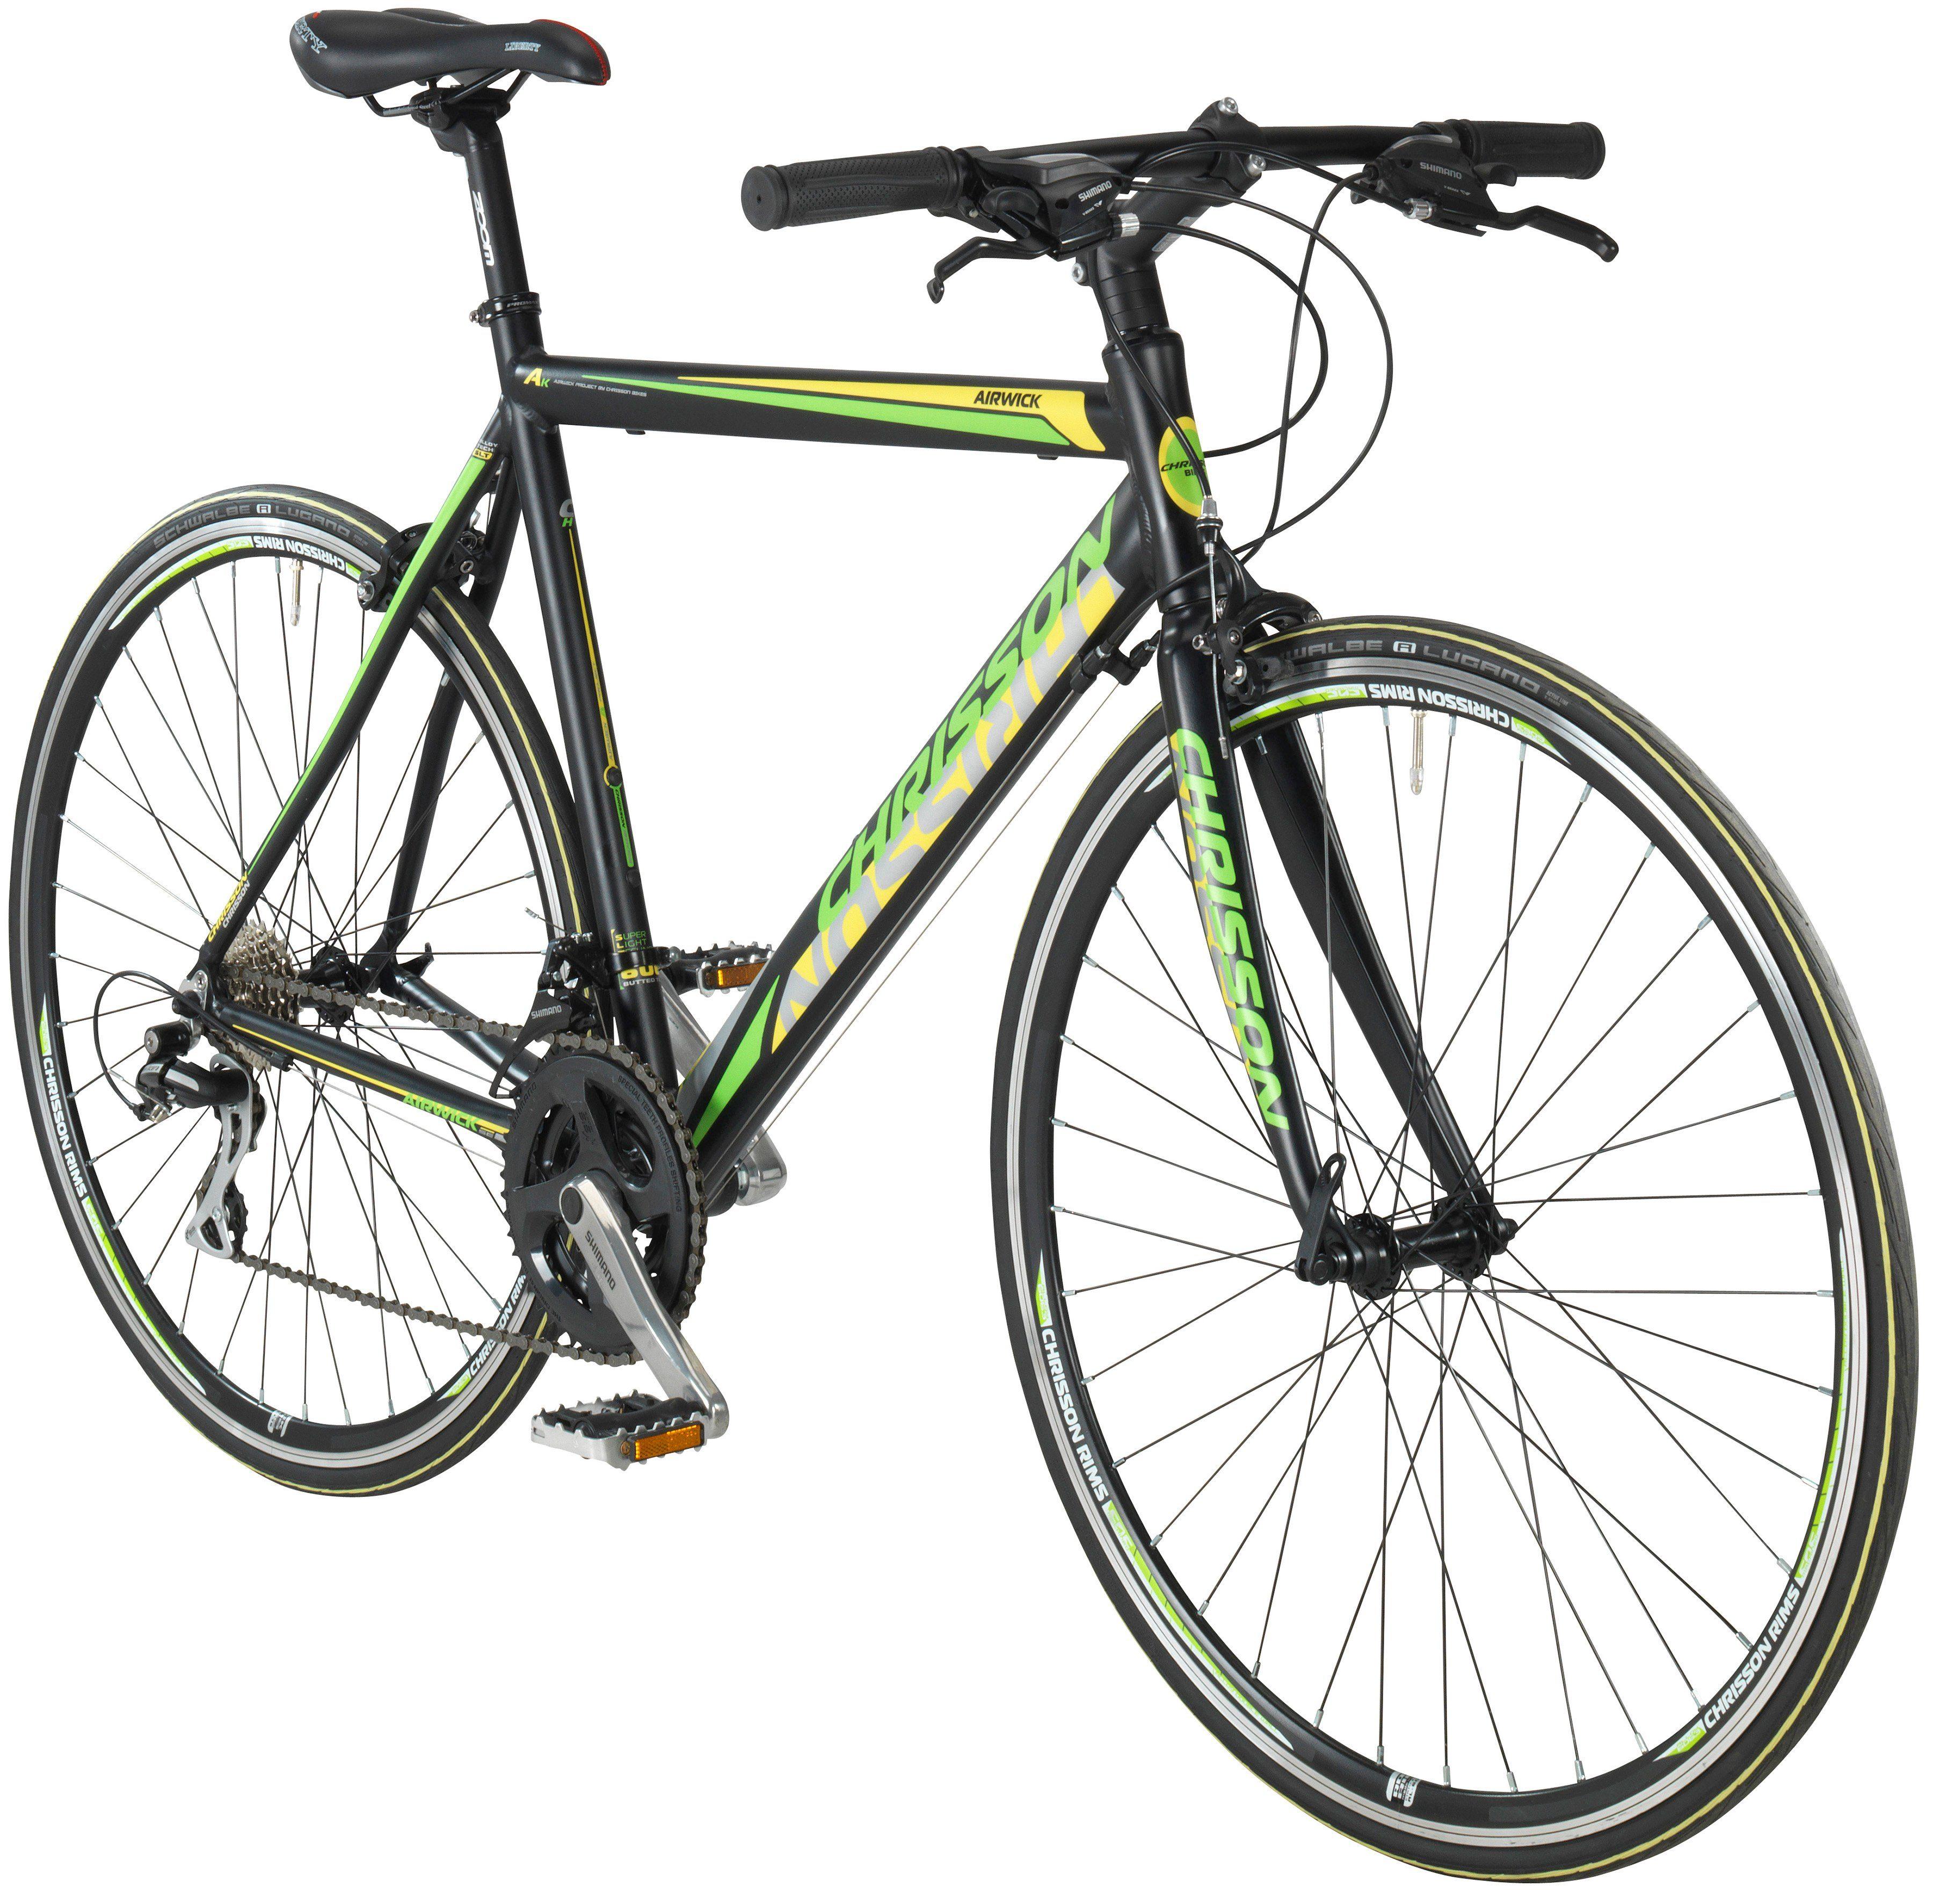 CHRISSON Fitnessbike »AIRWICK«, 28 Zoll, 24 Gang, Rennbremsen, RH 59